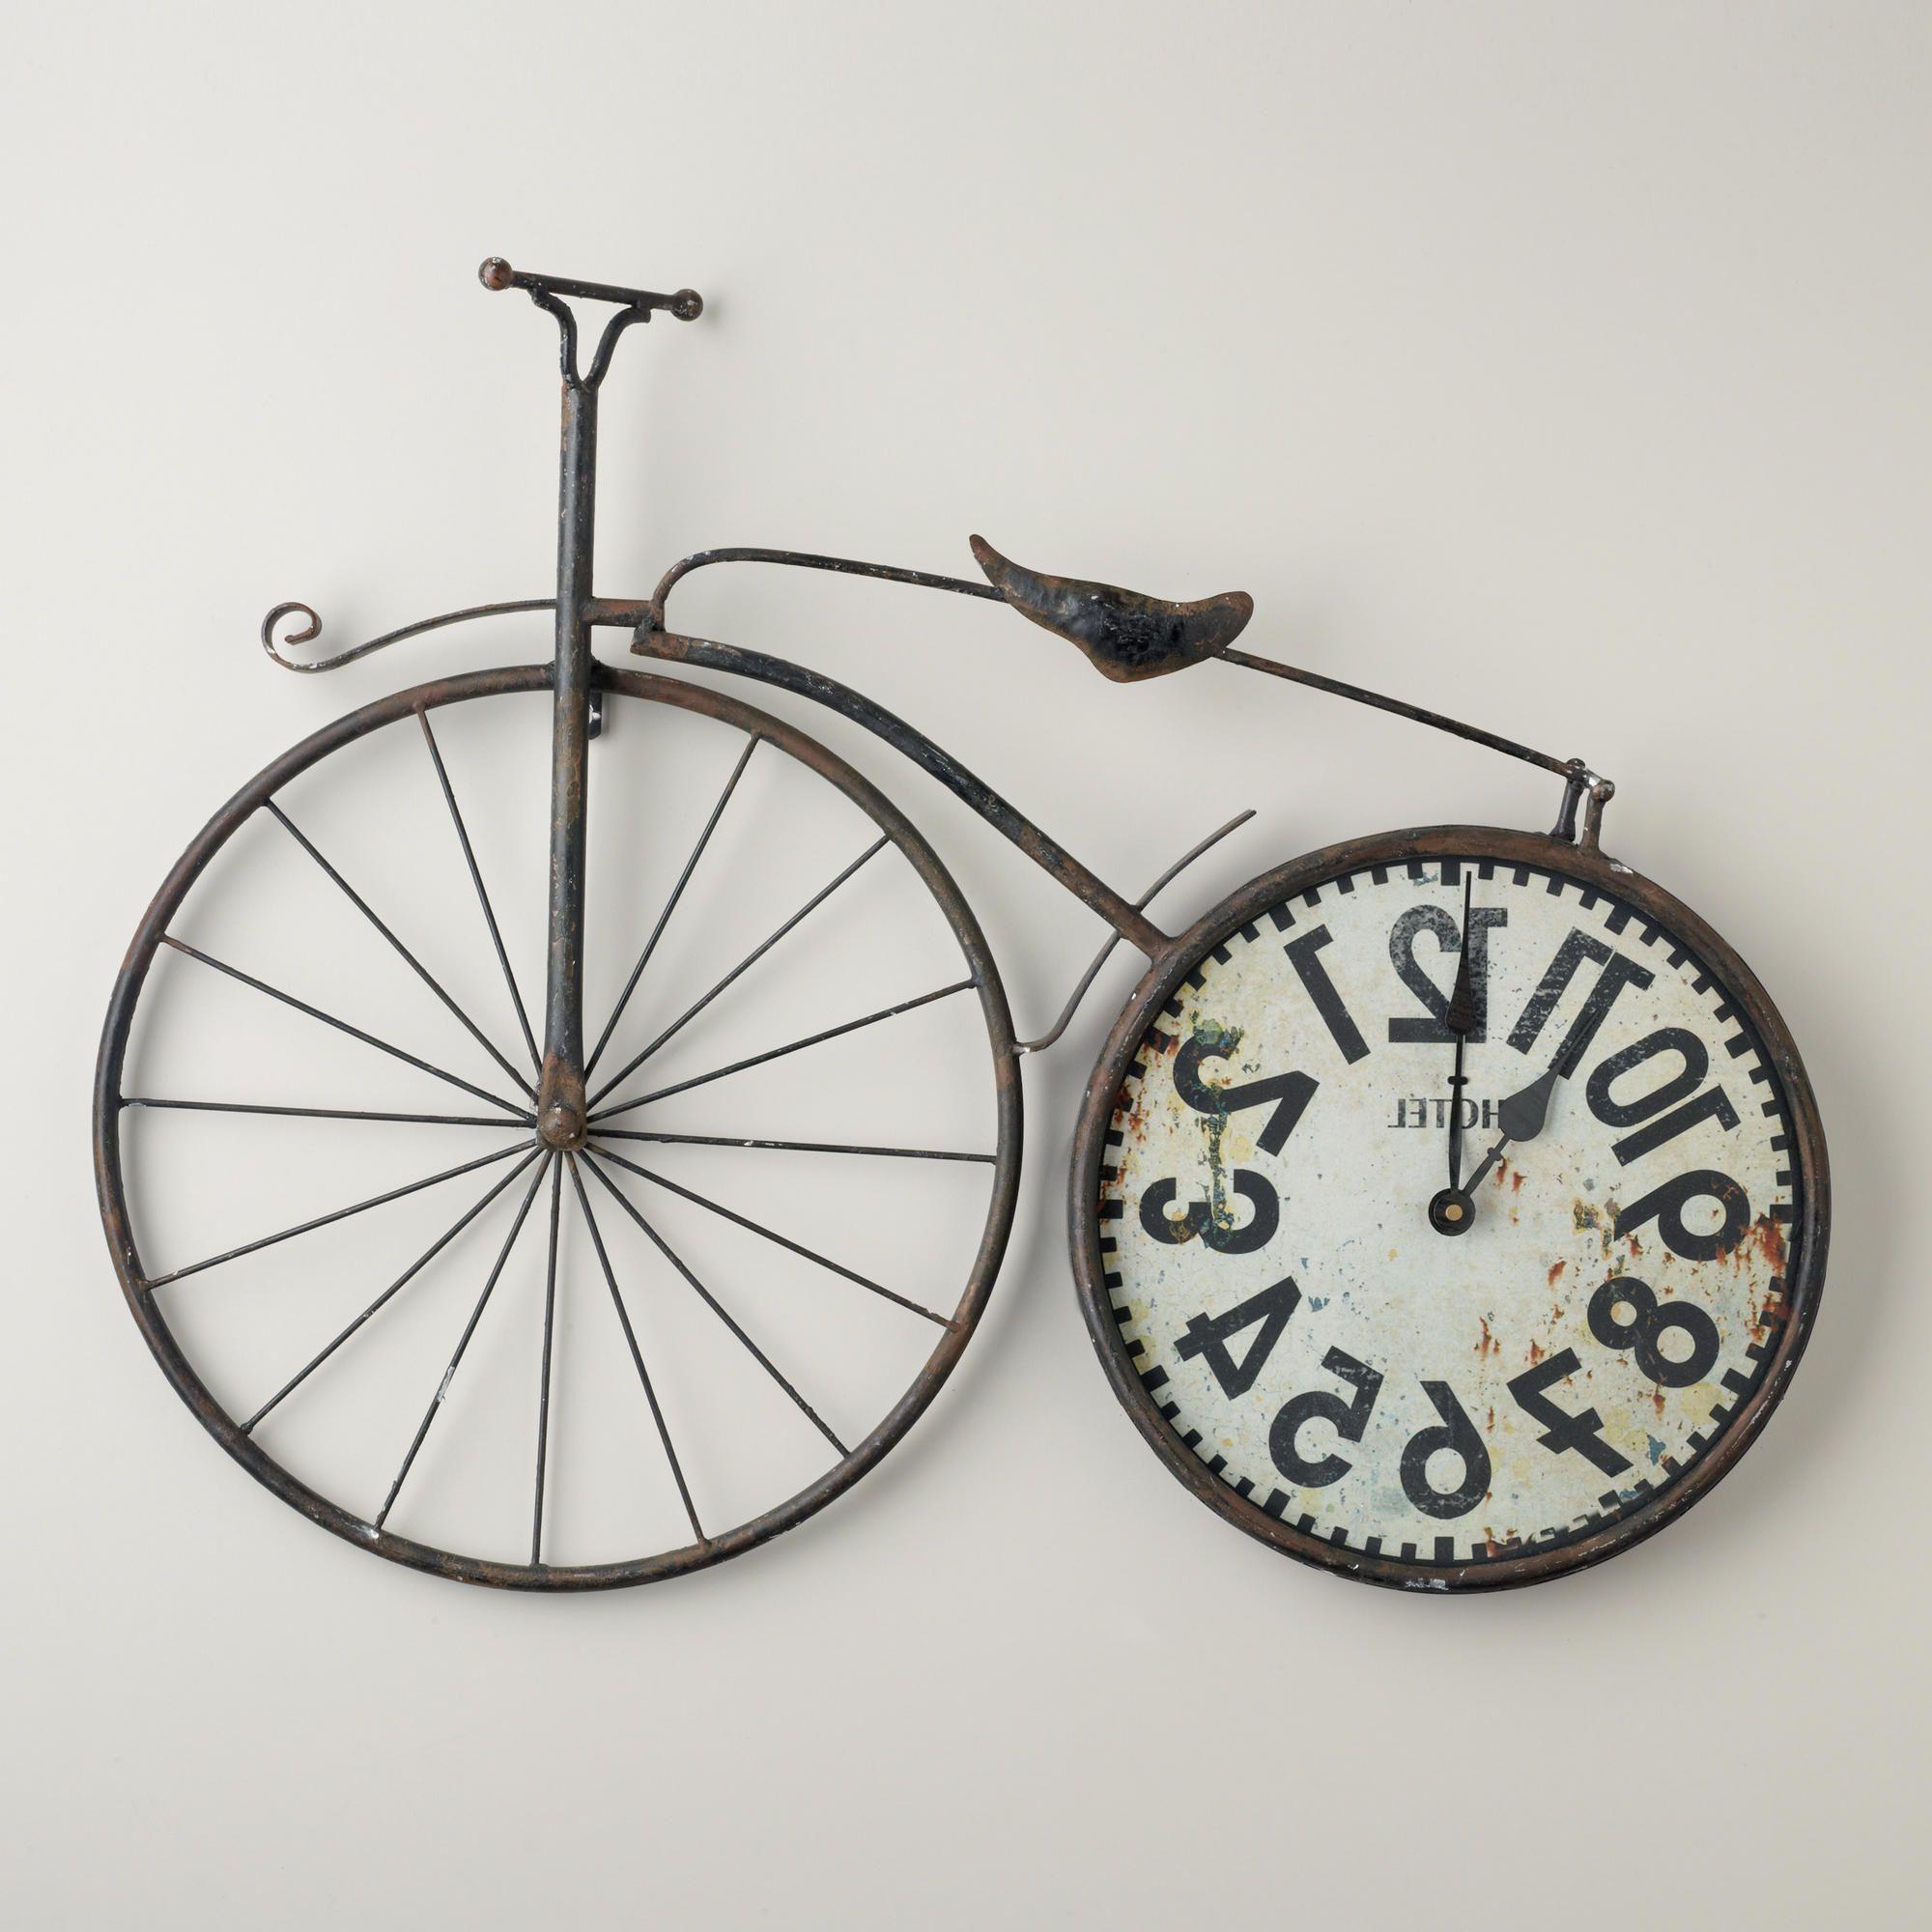 [%bicycle Wall Clock.. Eeeeeeeee!!!! :]]]] @bergann Hernandez For Current Bike Wall Decor By August Grove|bike Wall Decor By August Grove Inside Well Known Bicycle Wall Clock.. Eeeeeeeee!!!! :]]]] @bergann Hernandez|well Liked Bike Wall Decor By August Grove Within Bicycle Wall Clock.. Eeeeeeeee!!!! :]]]] @bergann Hernandez|latest Bicycle Wall Clock. (View 13 of 20)